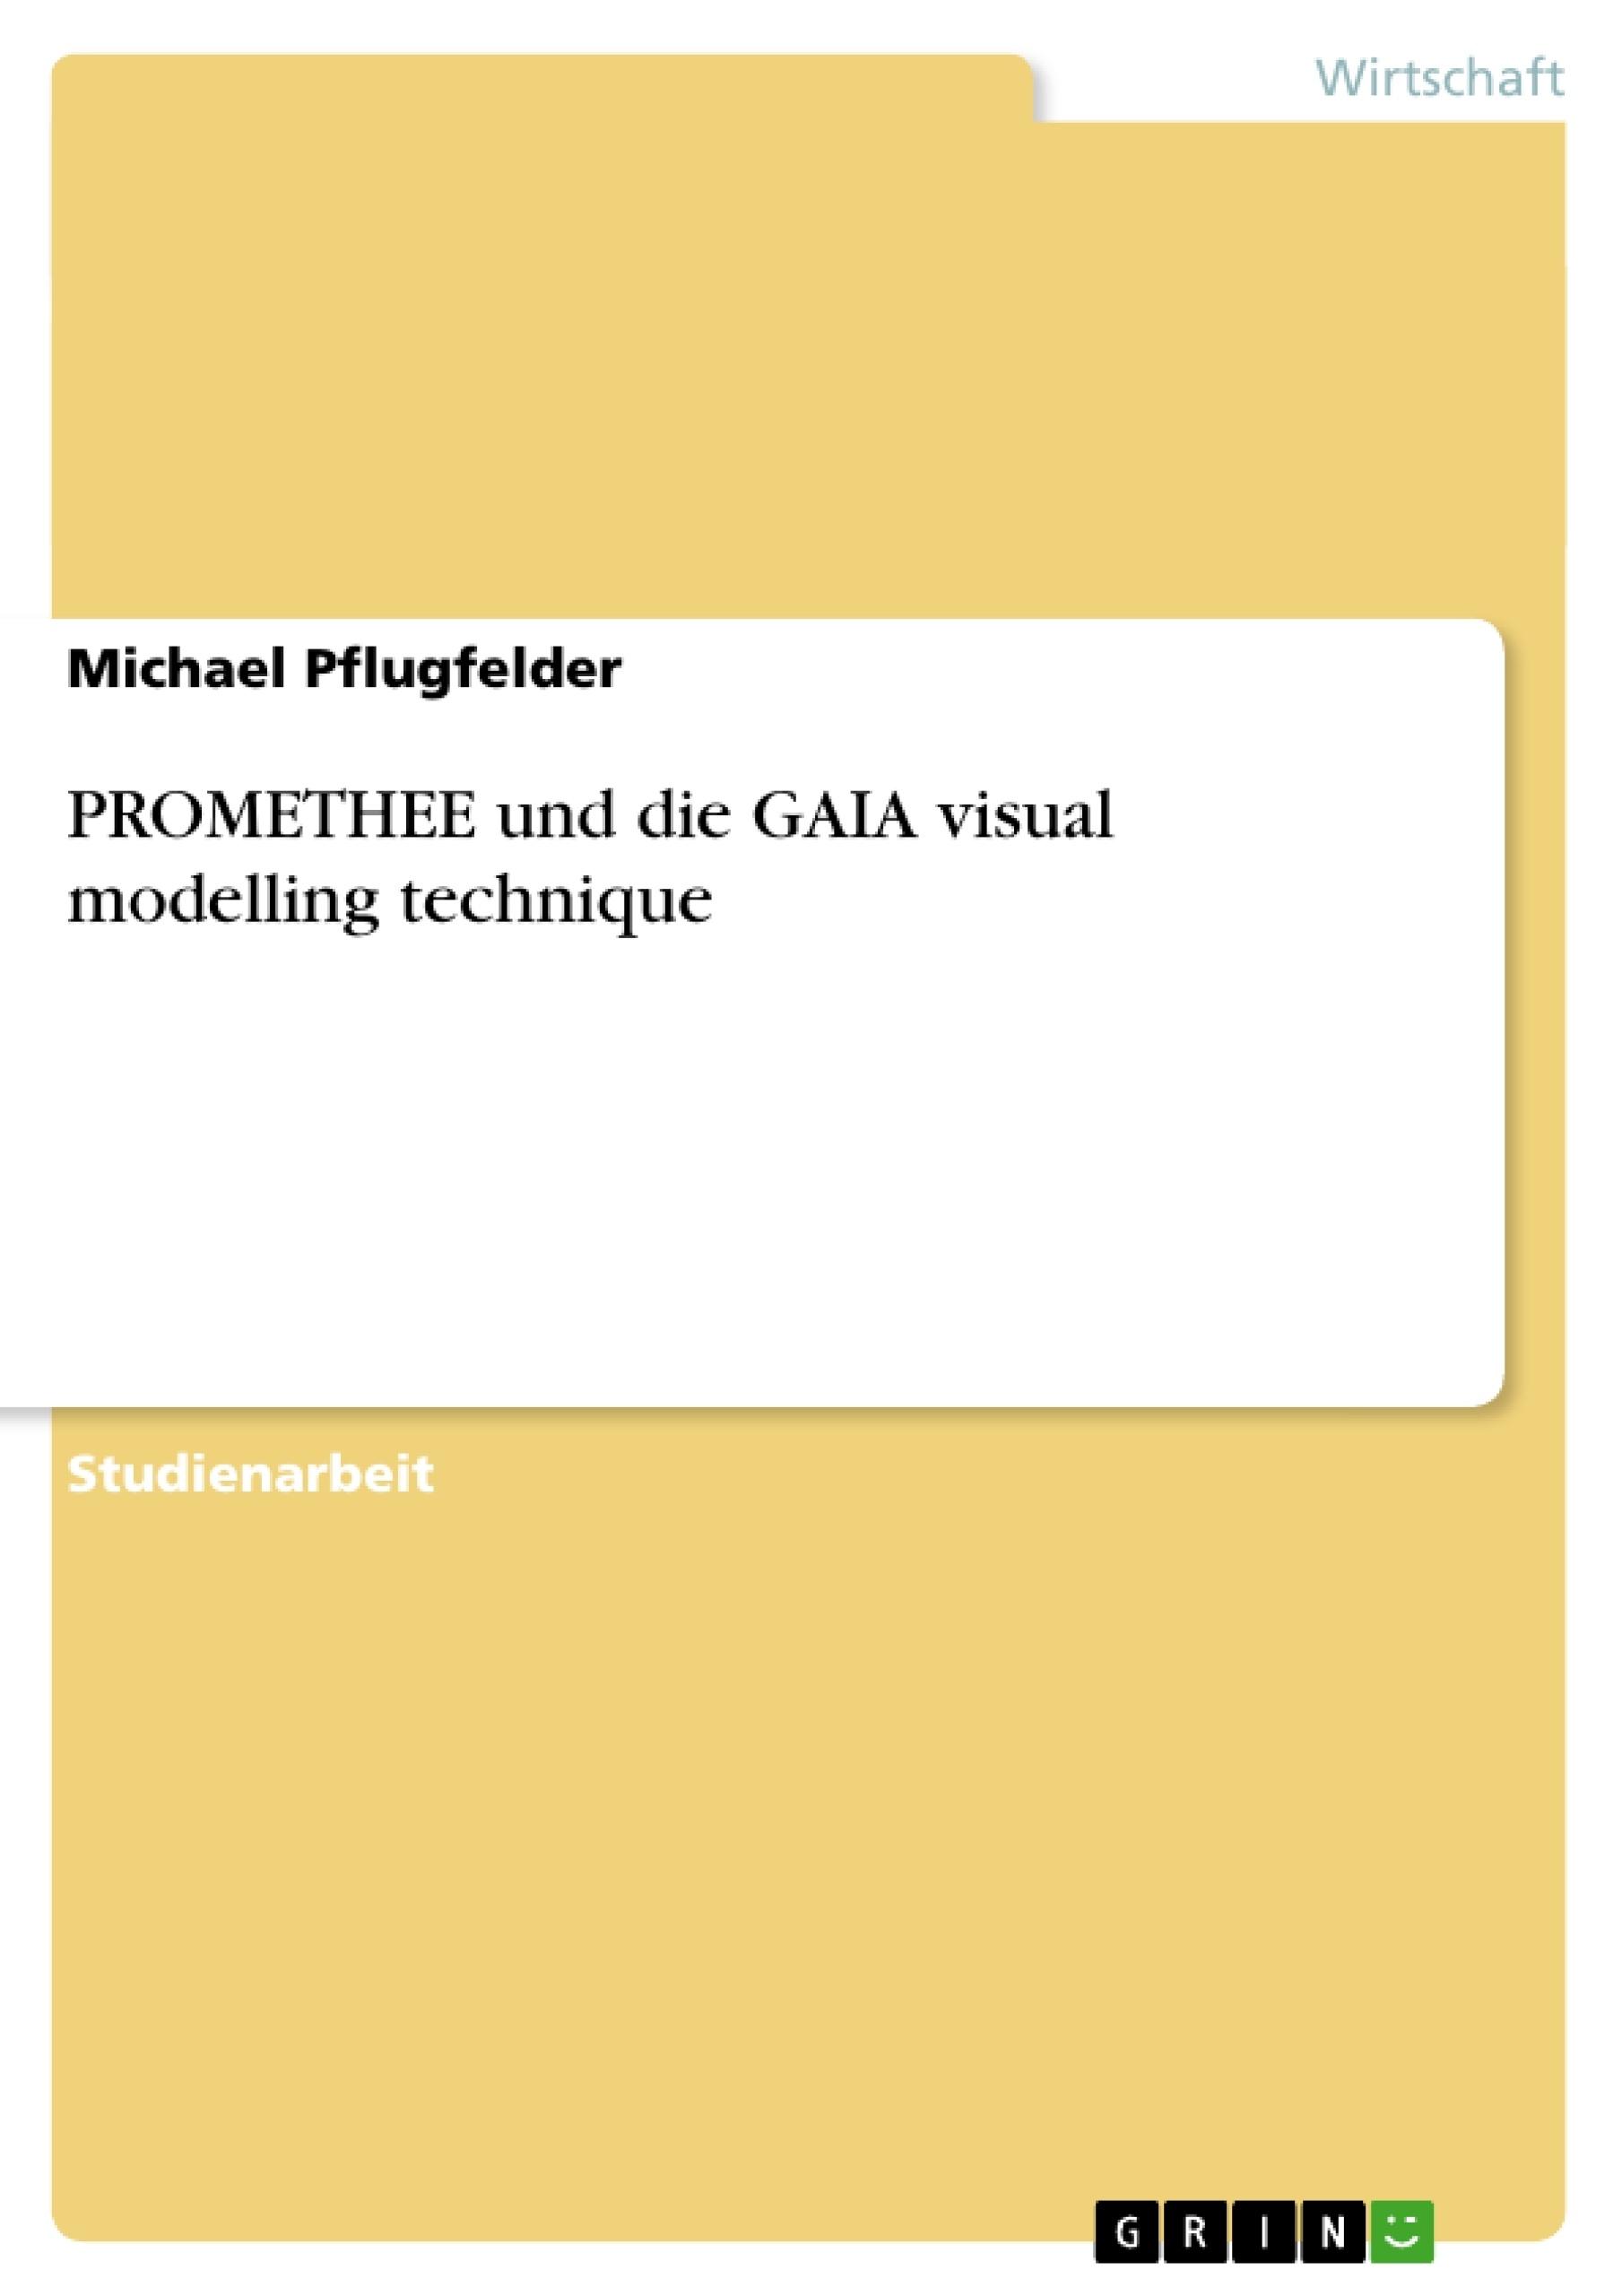 Titel: PROMETHEE und die GAIA visual modelling technique